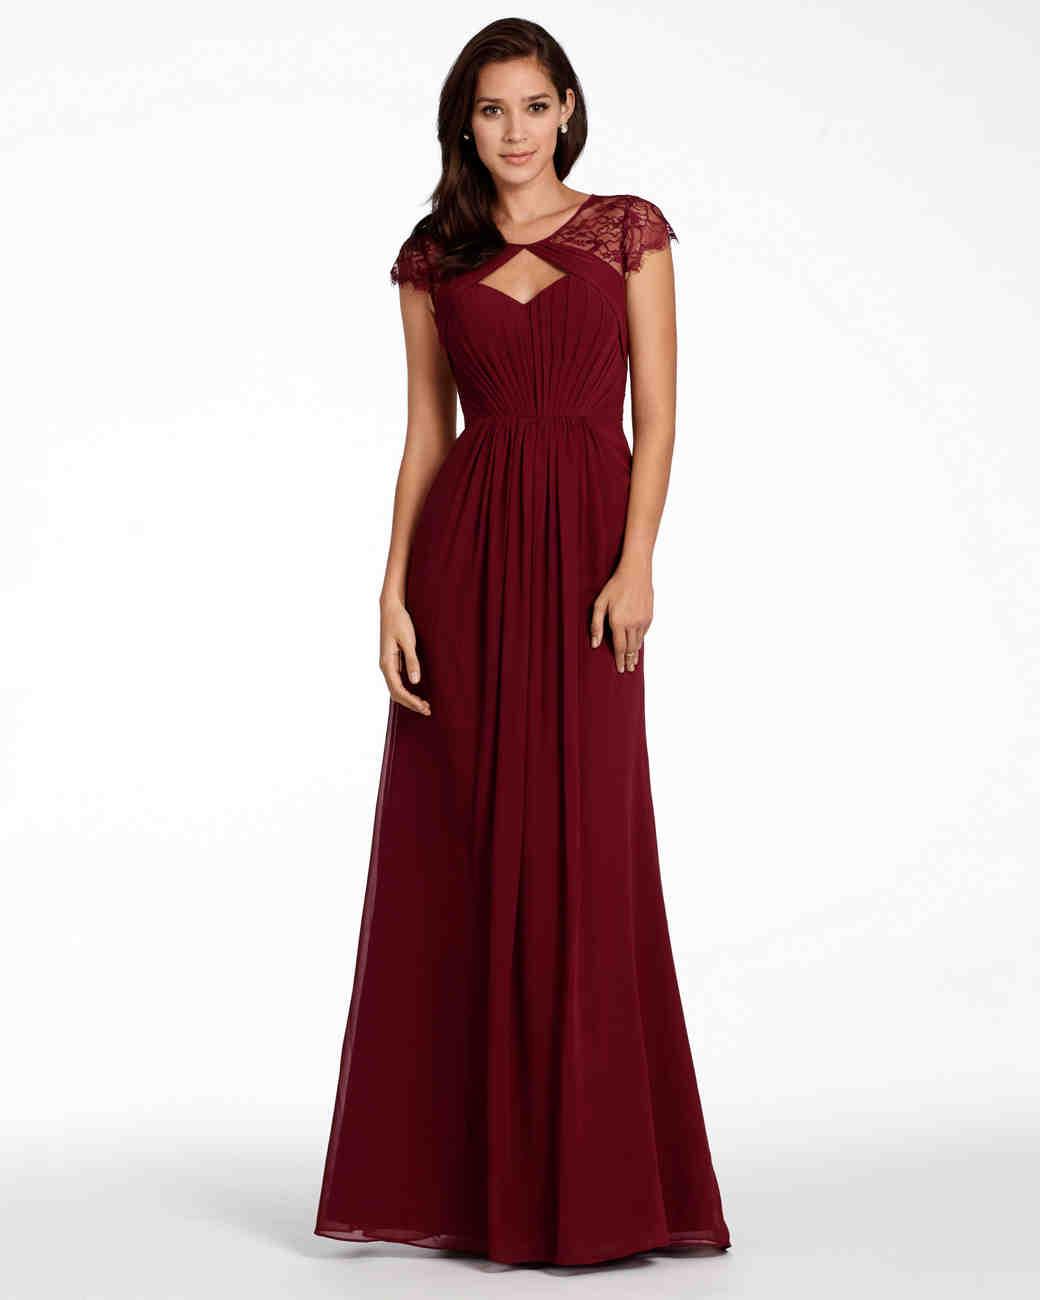 Burgundy Bridesmaid Dresses   Martha Stewart Weddings